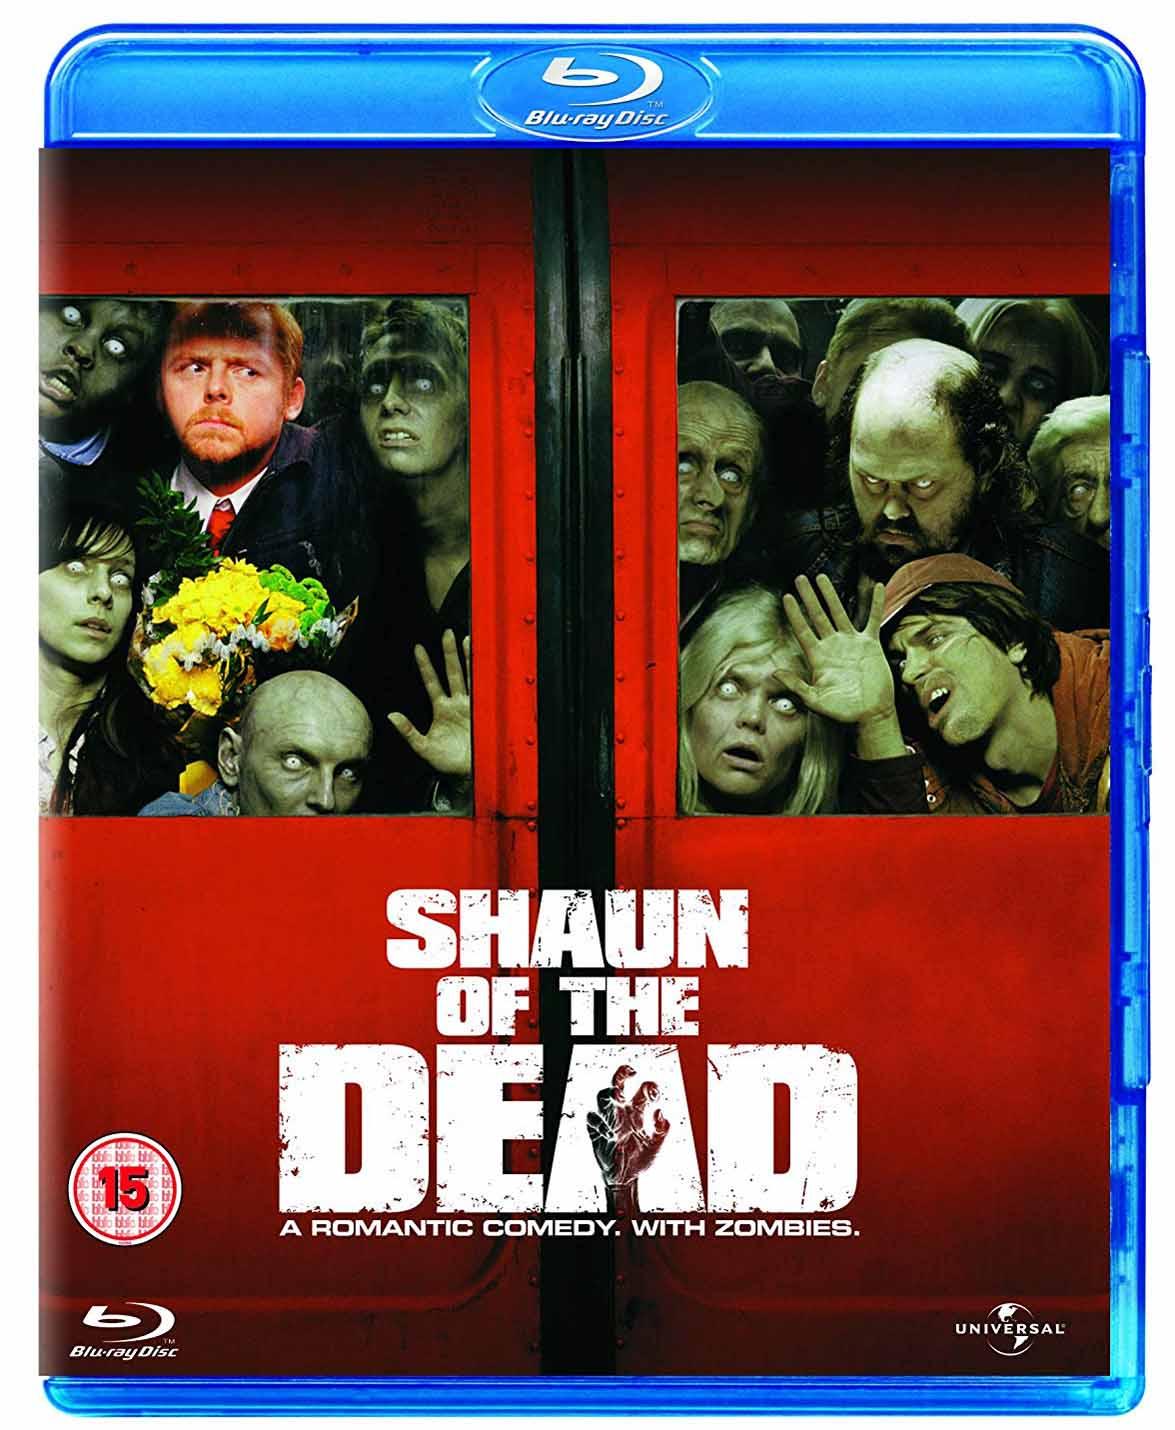 Download Shaun of the Dead (2004) BluRay 720p x264 [Dual Audio] [Hindi DD Torrent